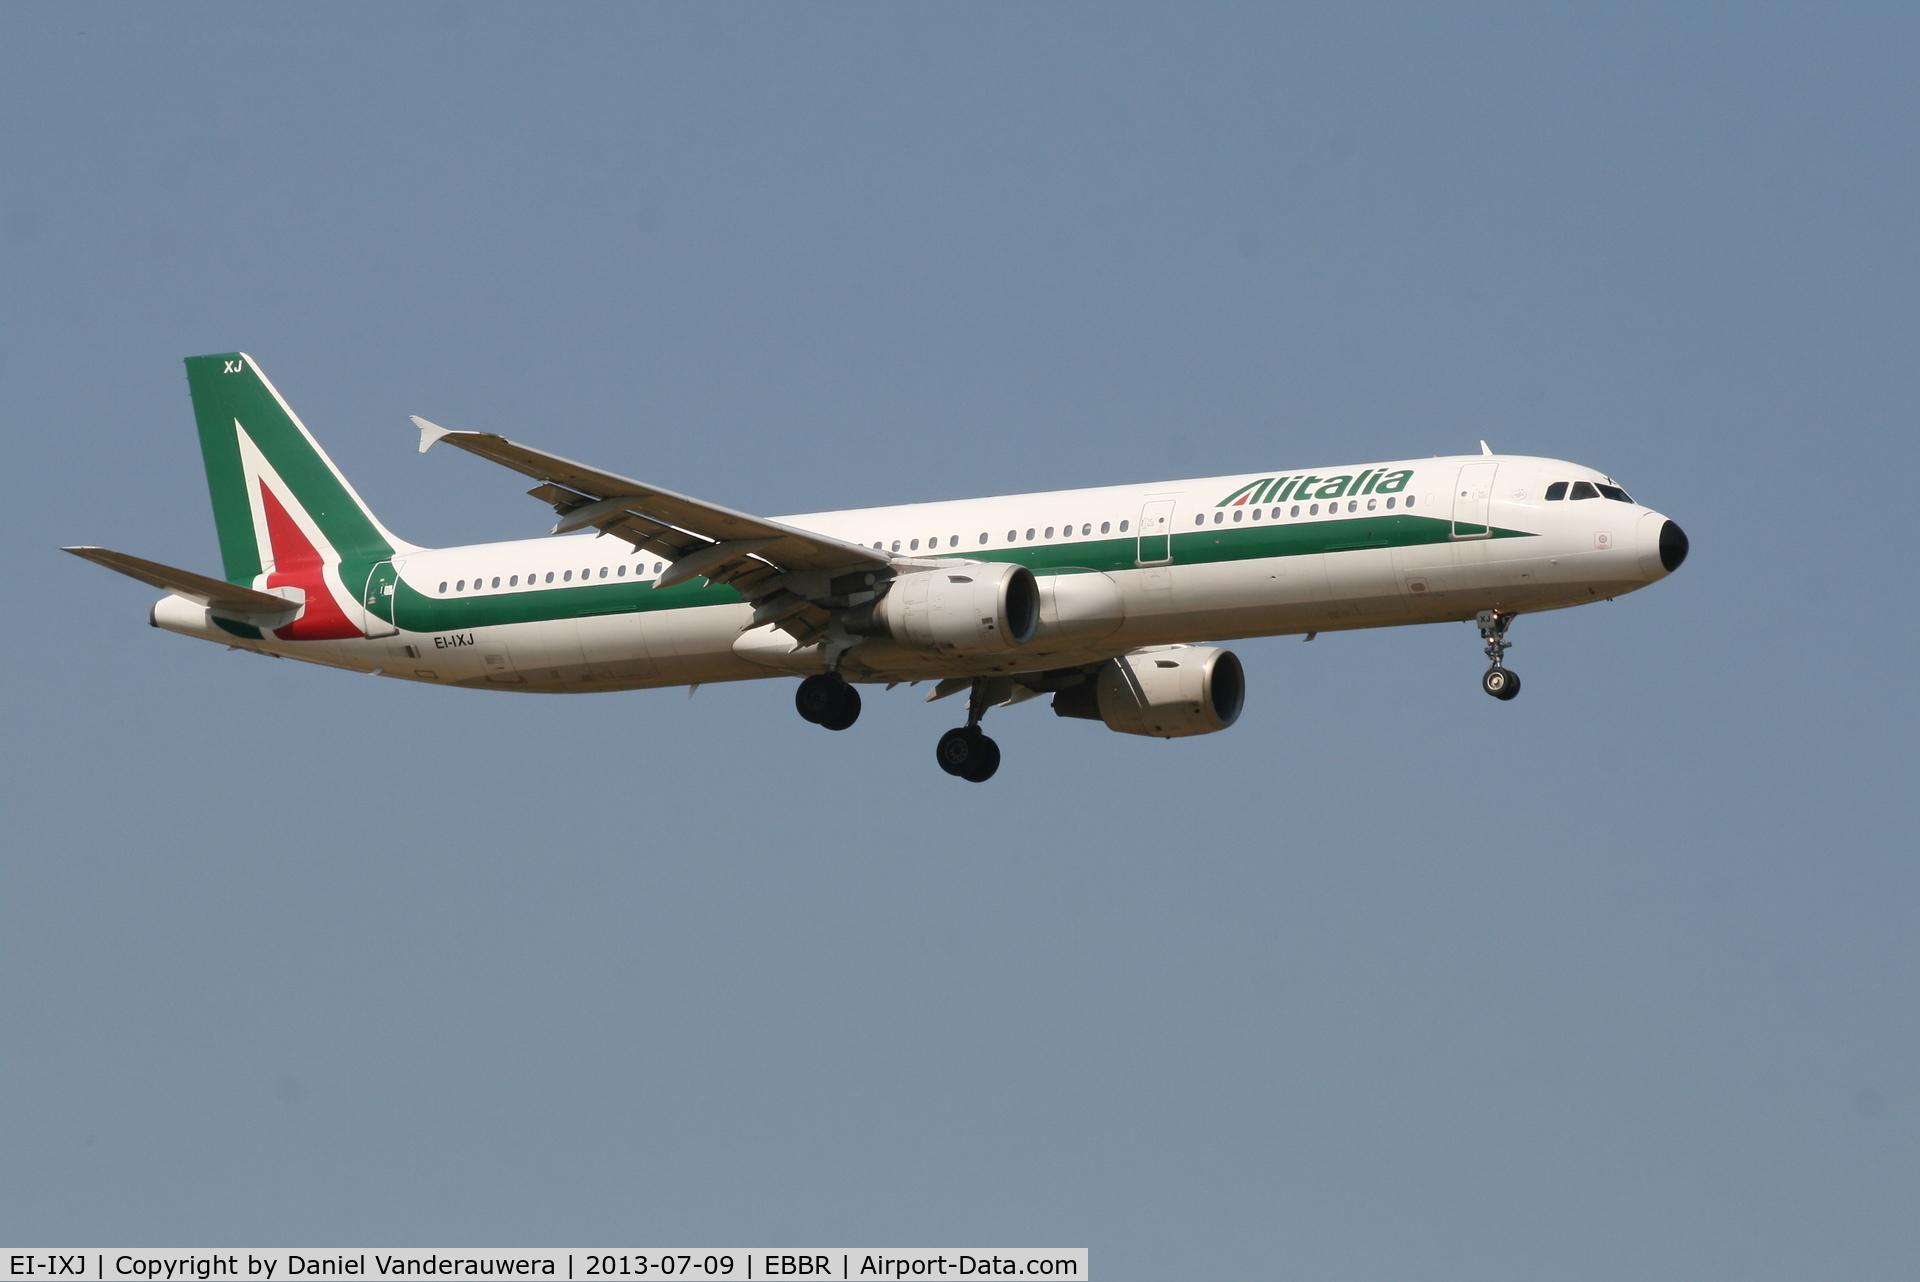 EI-IXJ, 1999 Airbus A321-112 C/N 959, Arrival of flight AZ156 to RWY 02